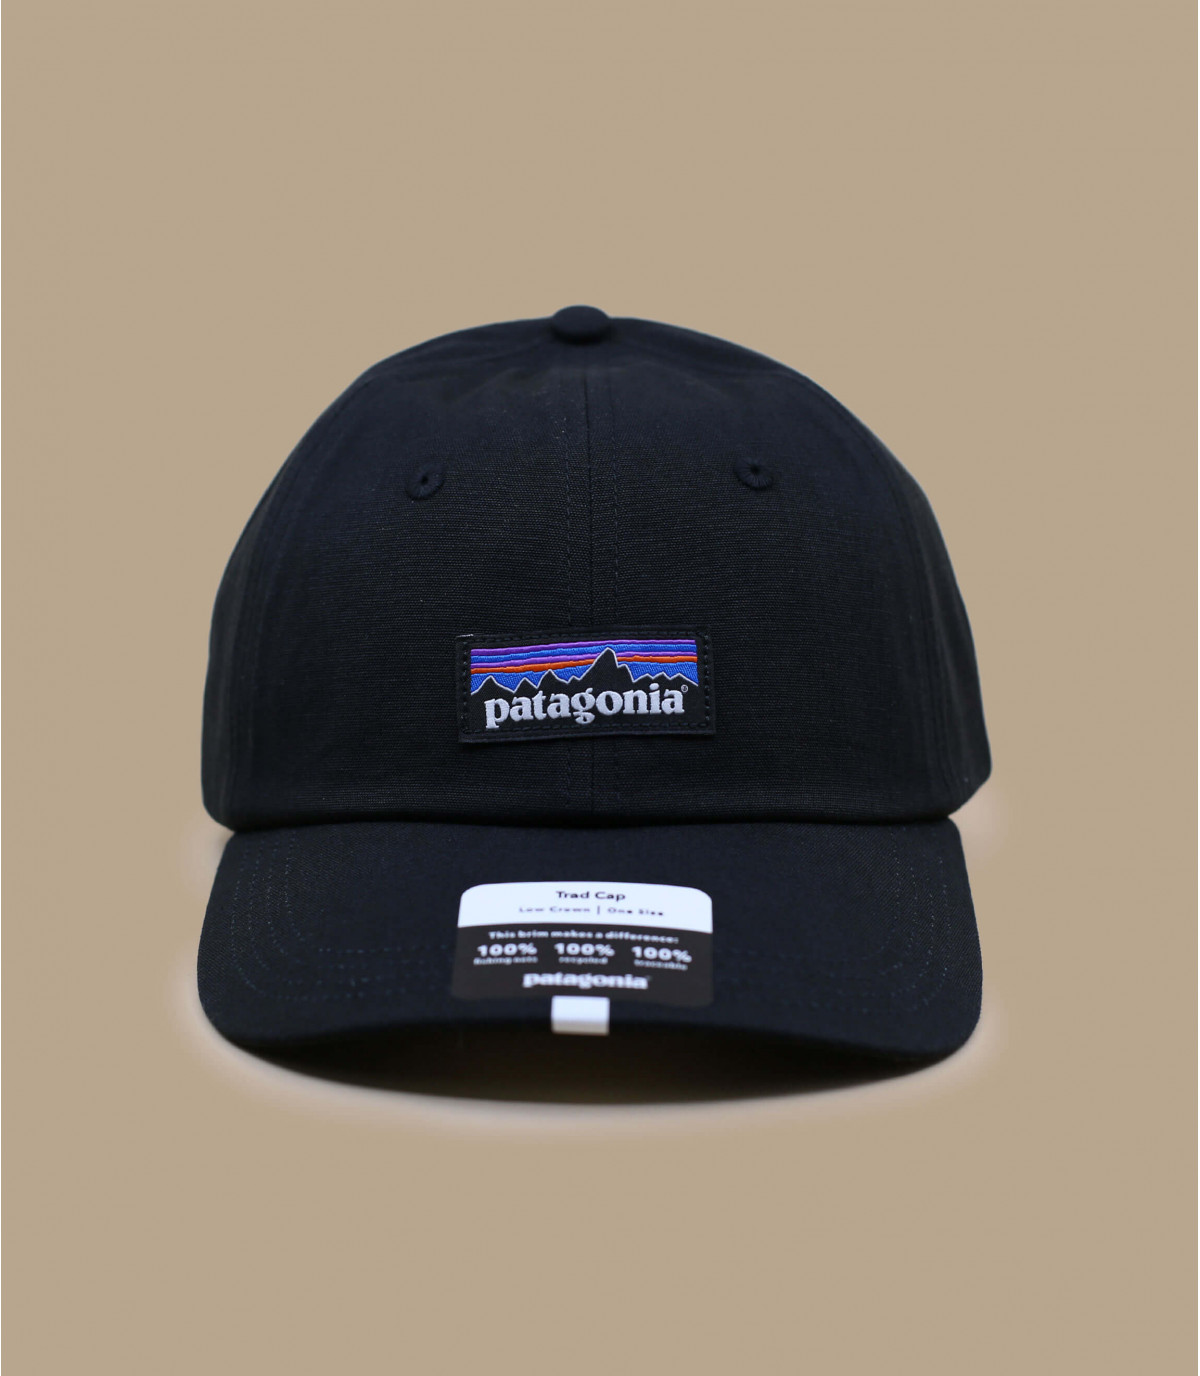 gorra Patagonia negro